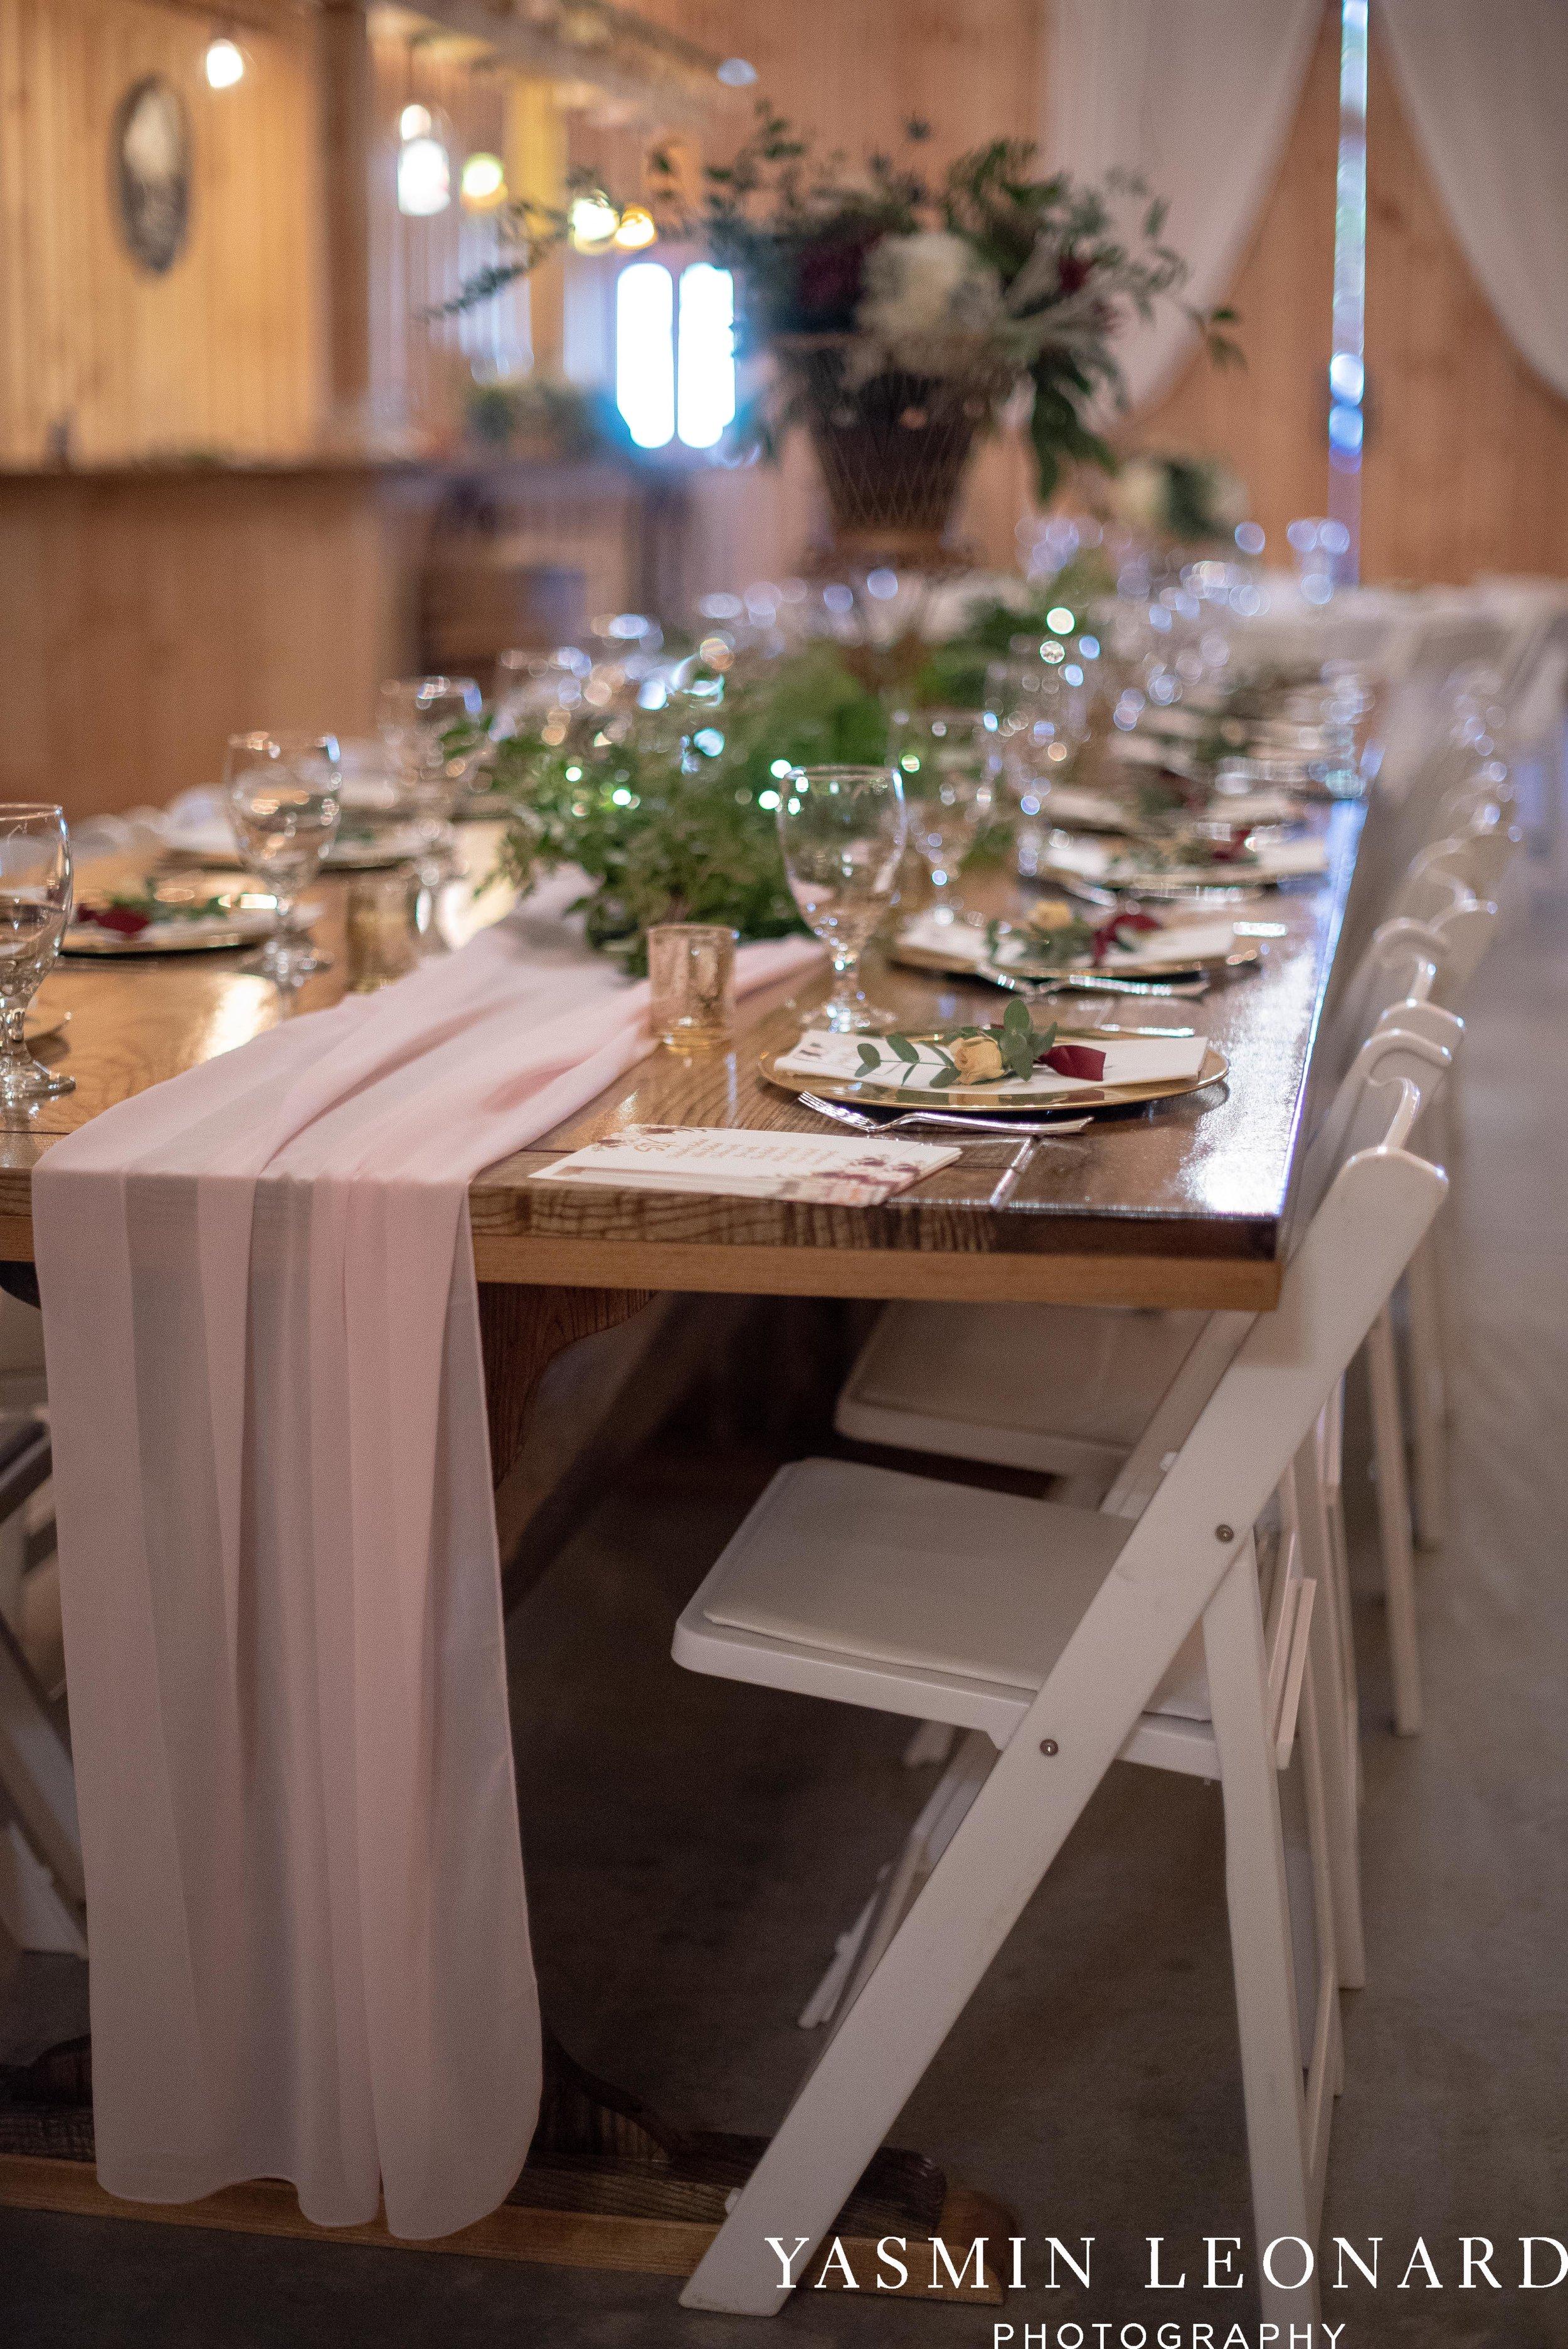 Wesley Memorial United Methodist Church - Old Homeplace Winery - High Point Weddings - High Point Wedding Photographer - NC Weddings - NC Barn Venue - Yasmin Leonard Photography-45.jpg